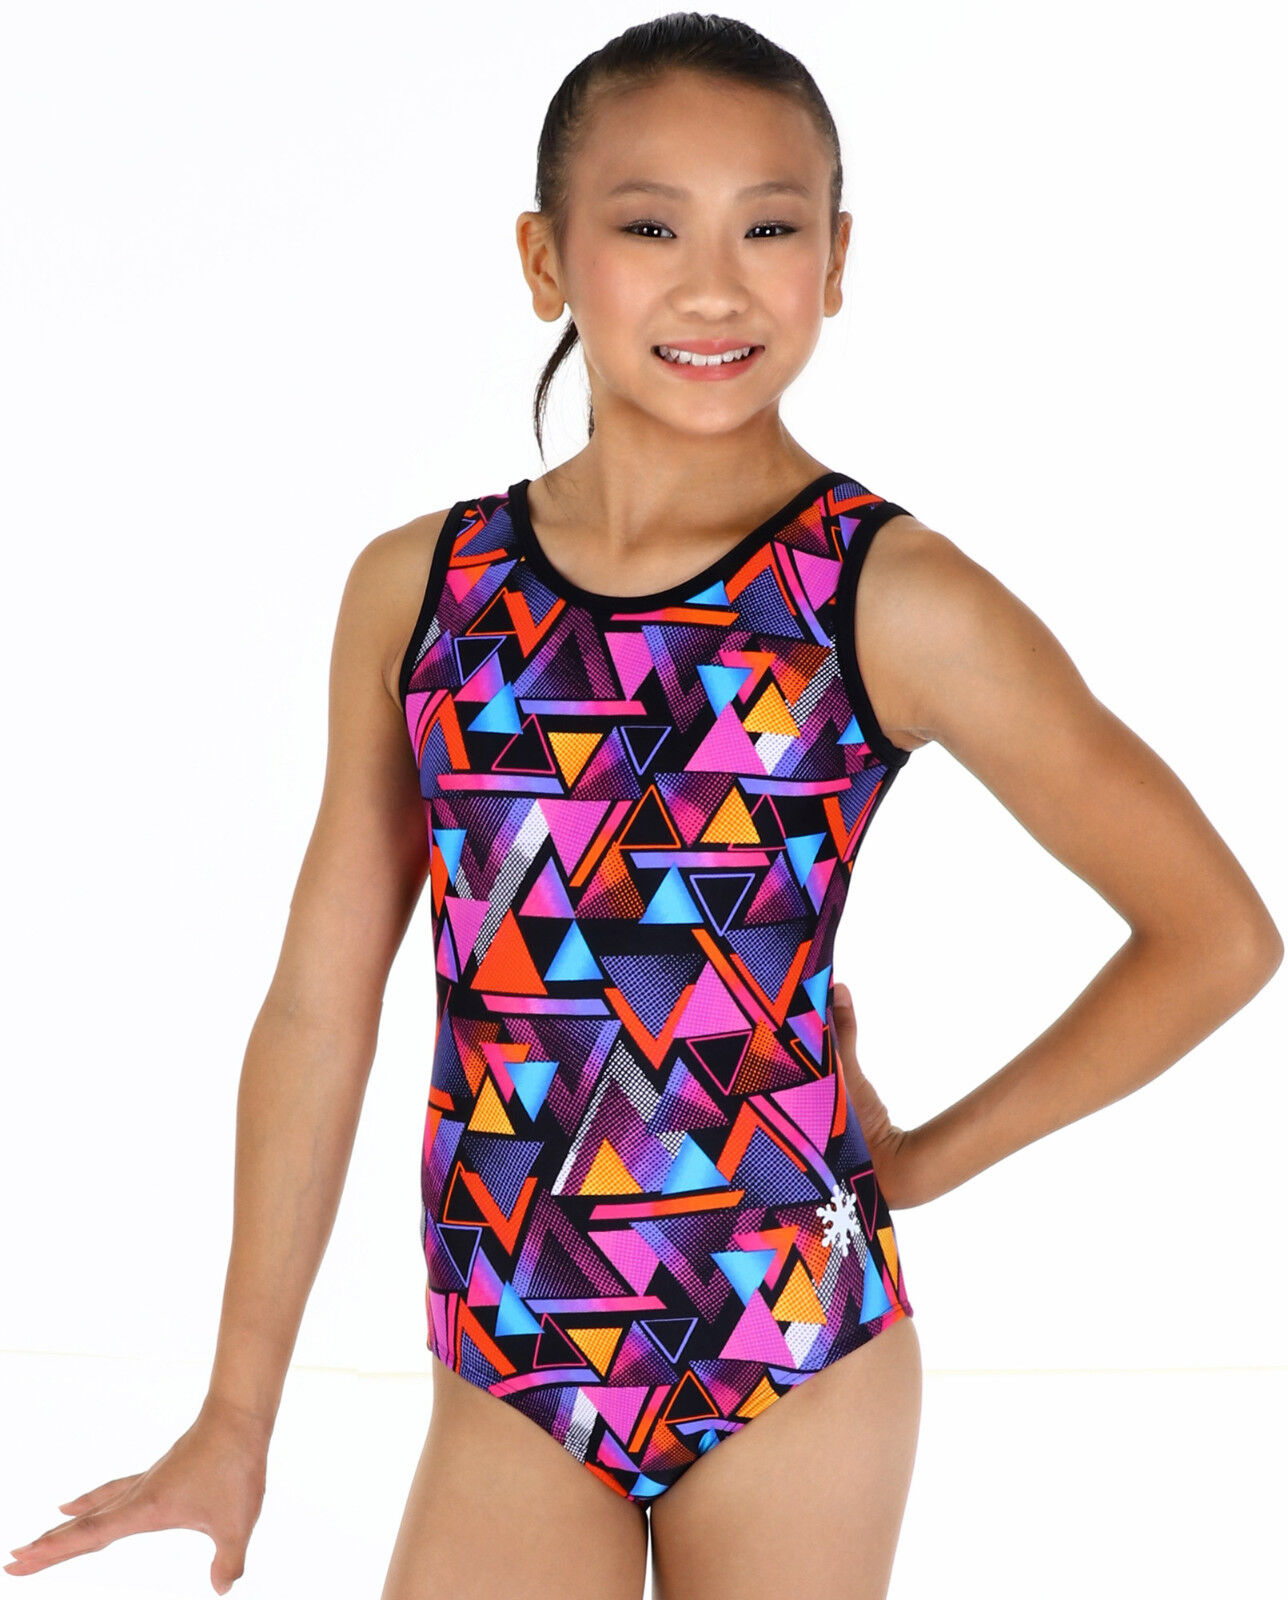 NEW  Triangles Gymnastics Leotard by Snowflake Designs